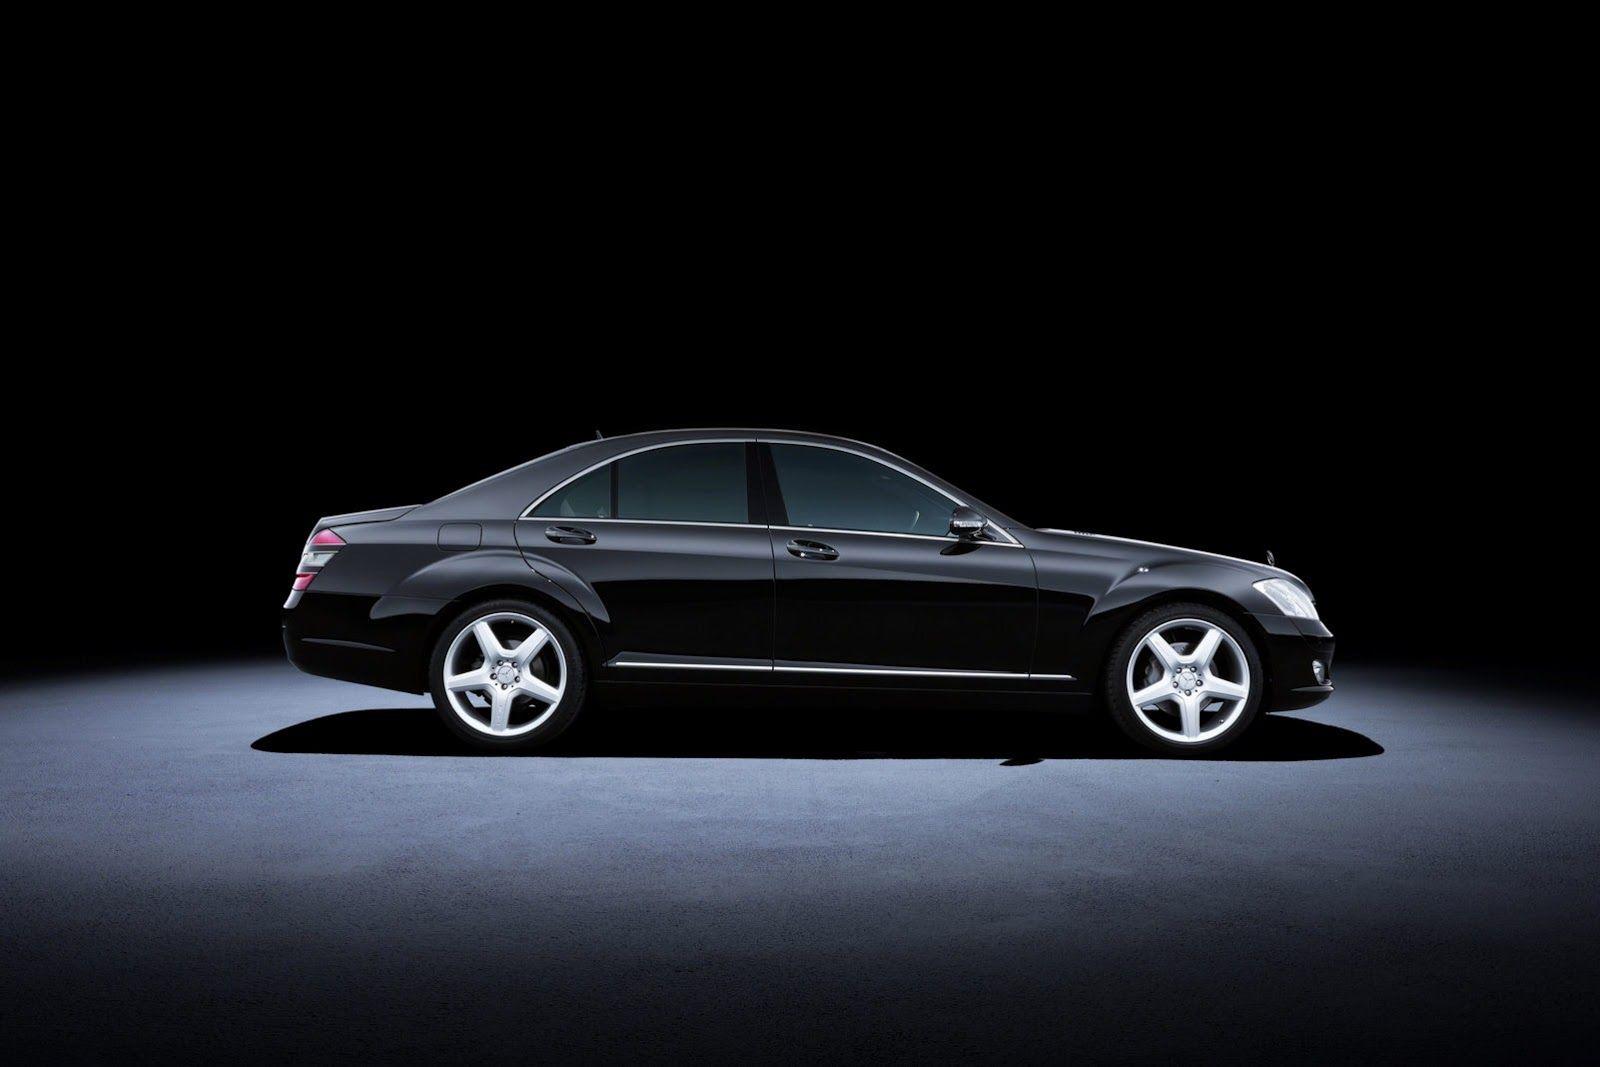 14 generations of big luxury mercedes benz cars 13 mercedes benz s